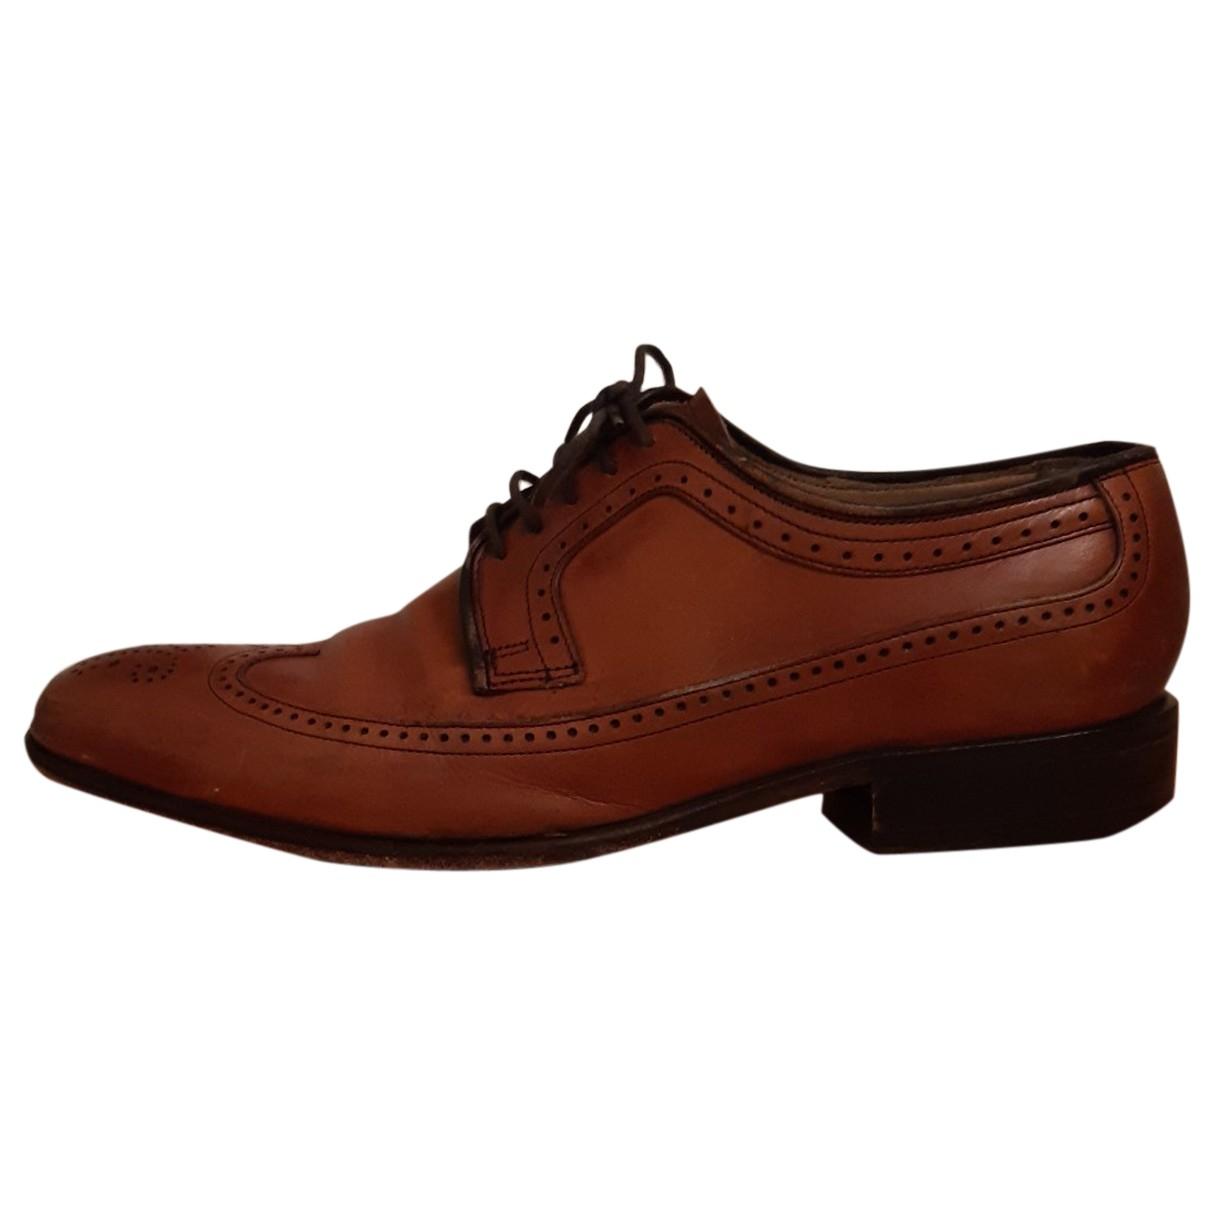 Barker N Brown Leather Lace ups for Men 7.5 UK